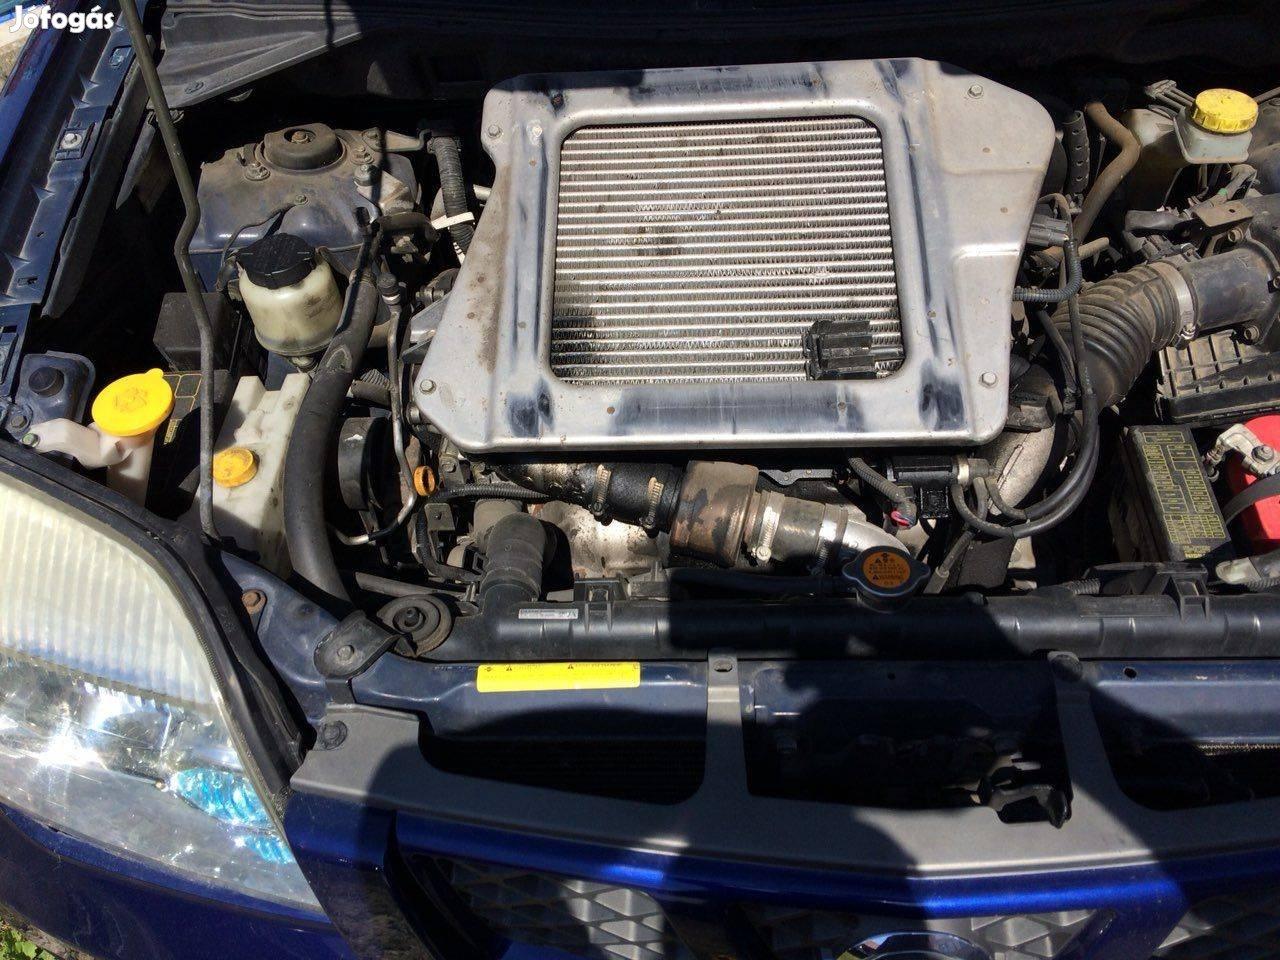 Nissan X-trail 2.2 Dci YD22ETI motor alkatrészei